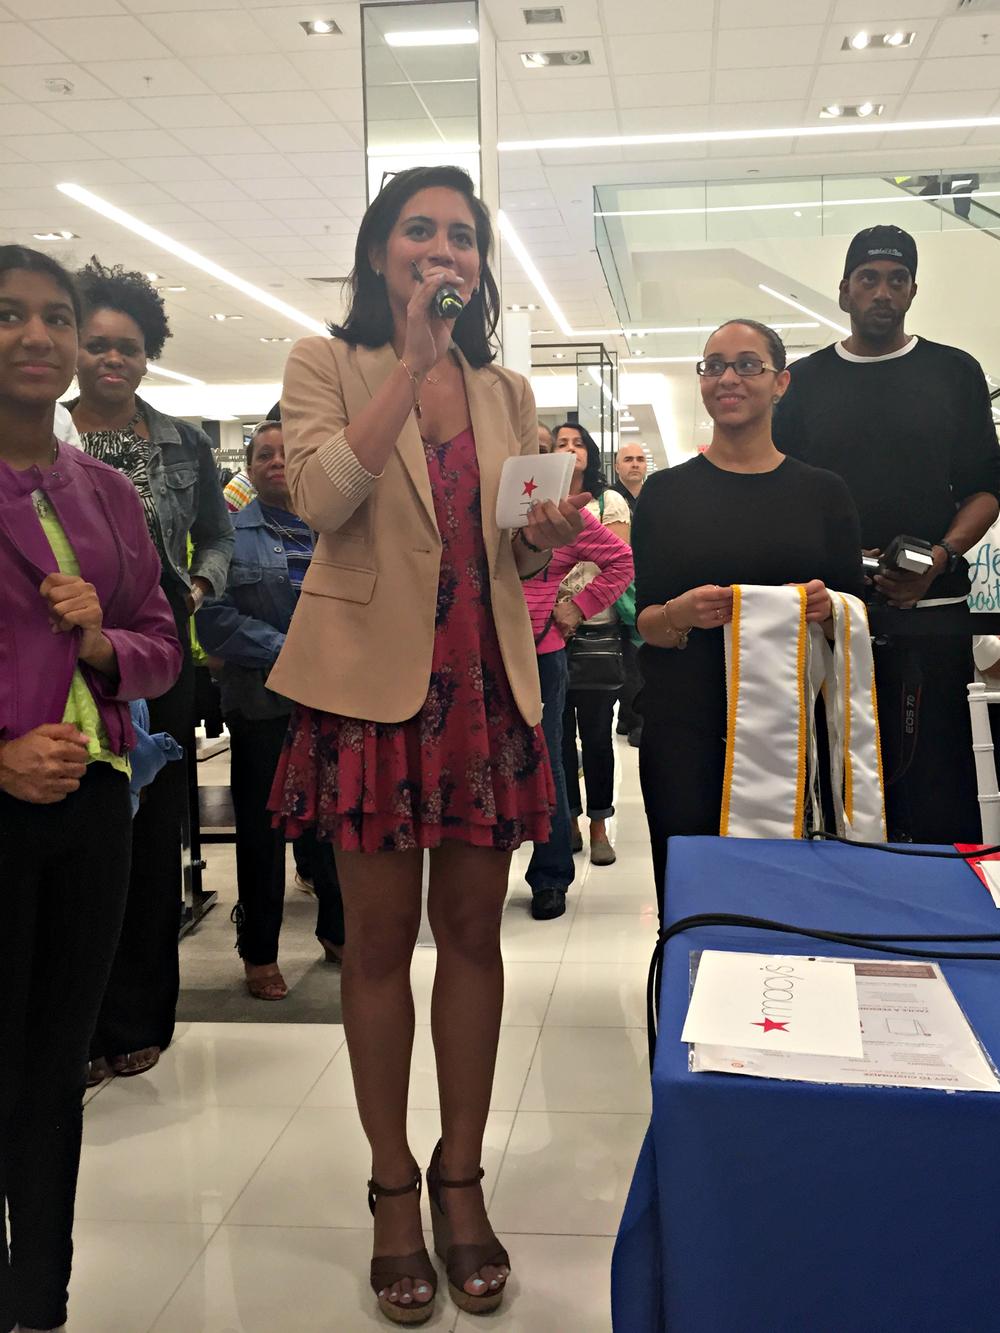 National Puerto Rican Day Parade (NPRDP) Rising Star Scholarship